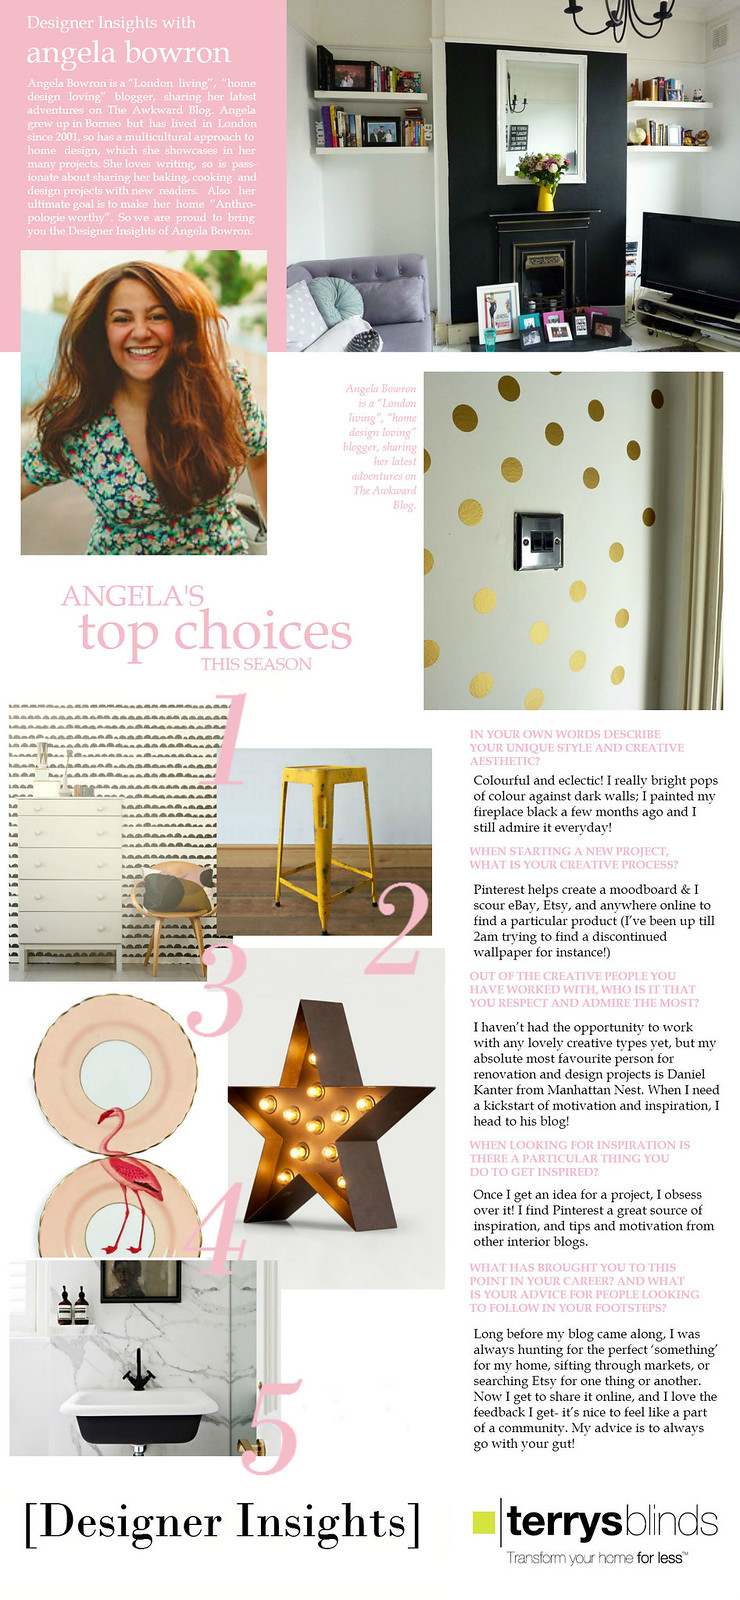 Designer Insights - Angela Bowron